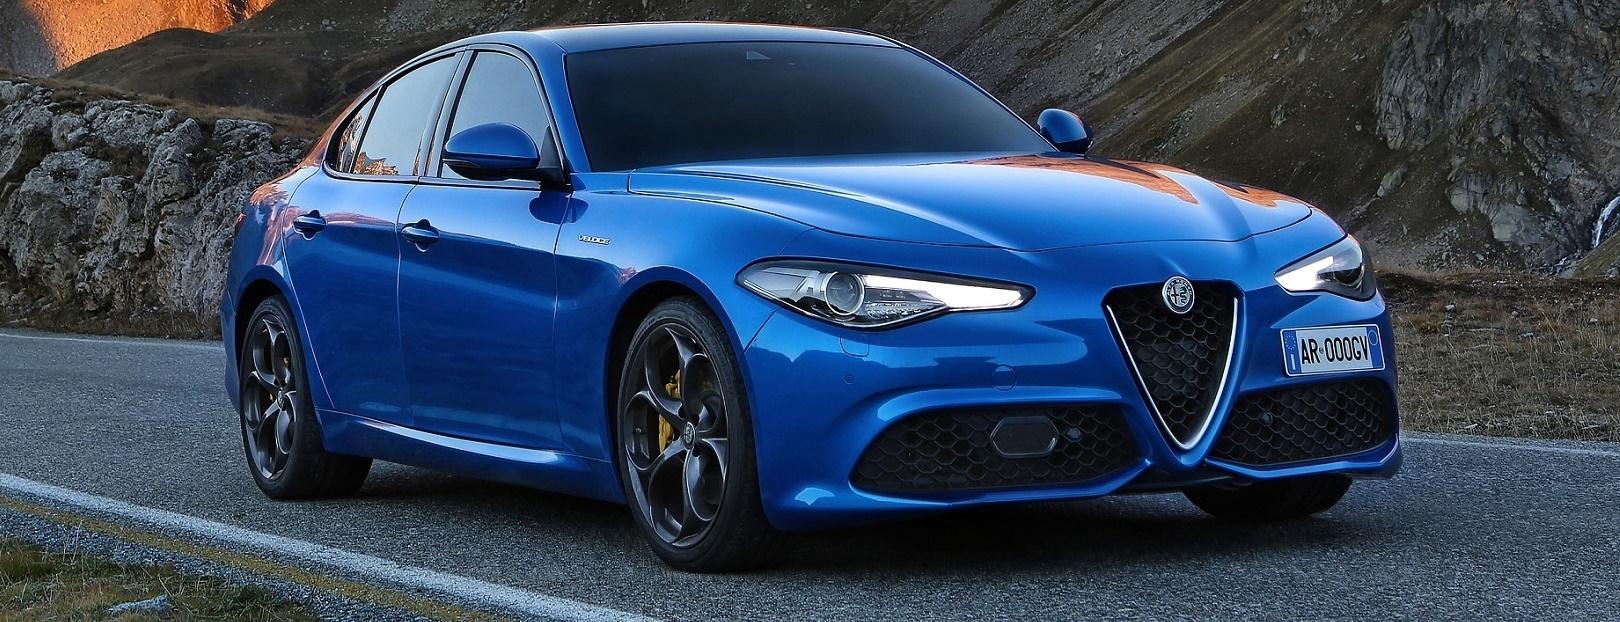 "Alfa Romeo Giulia: noleggio lungo termine ""Veloce"""